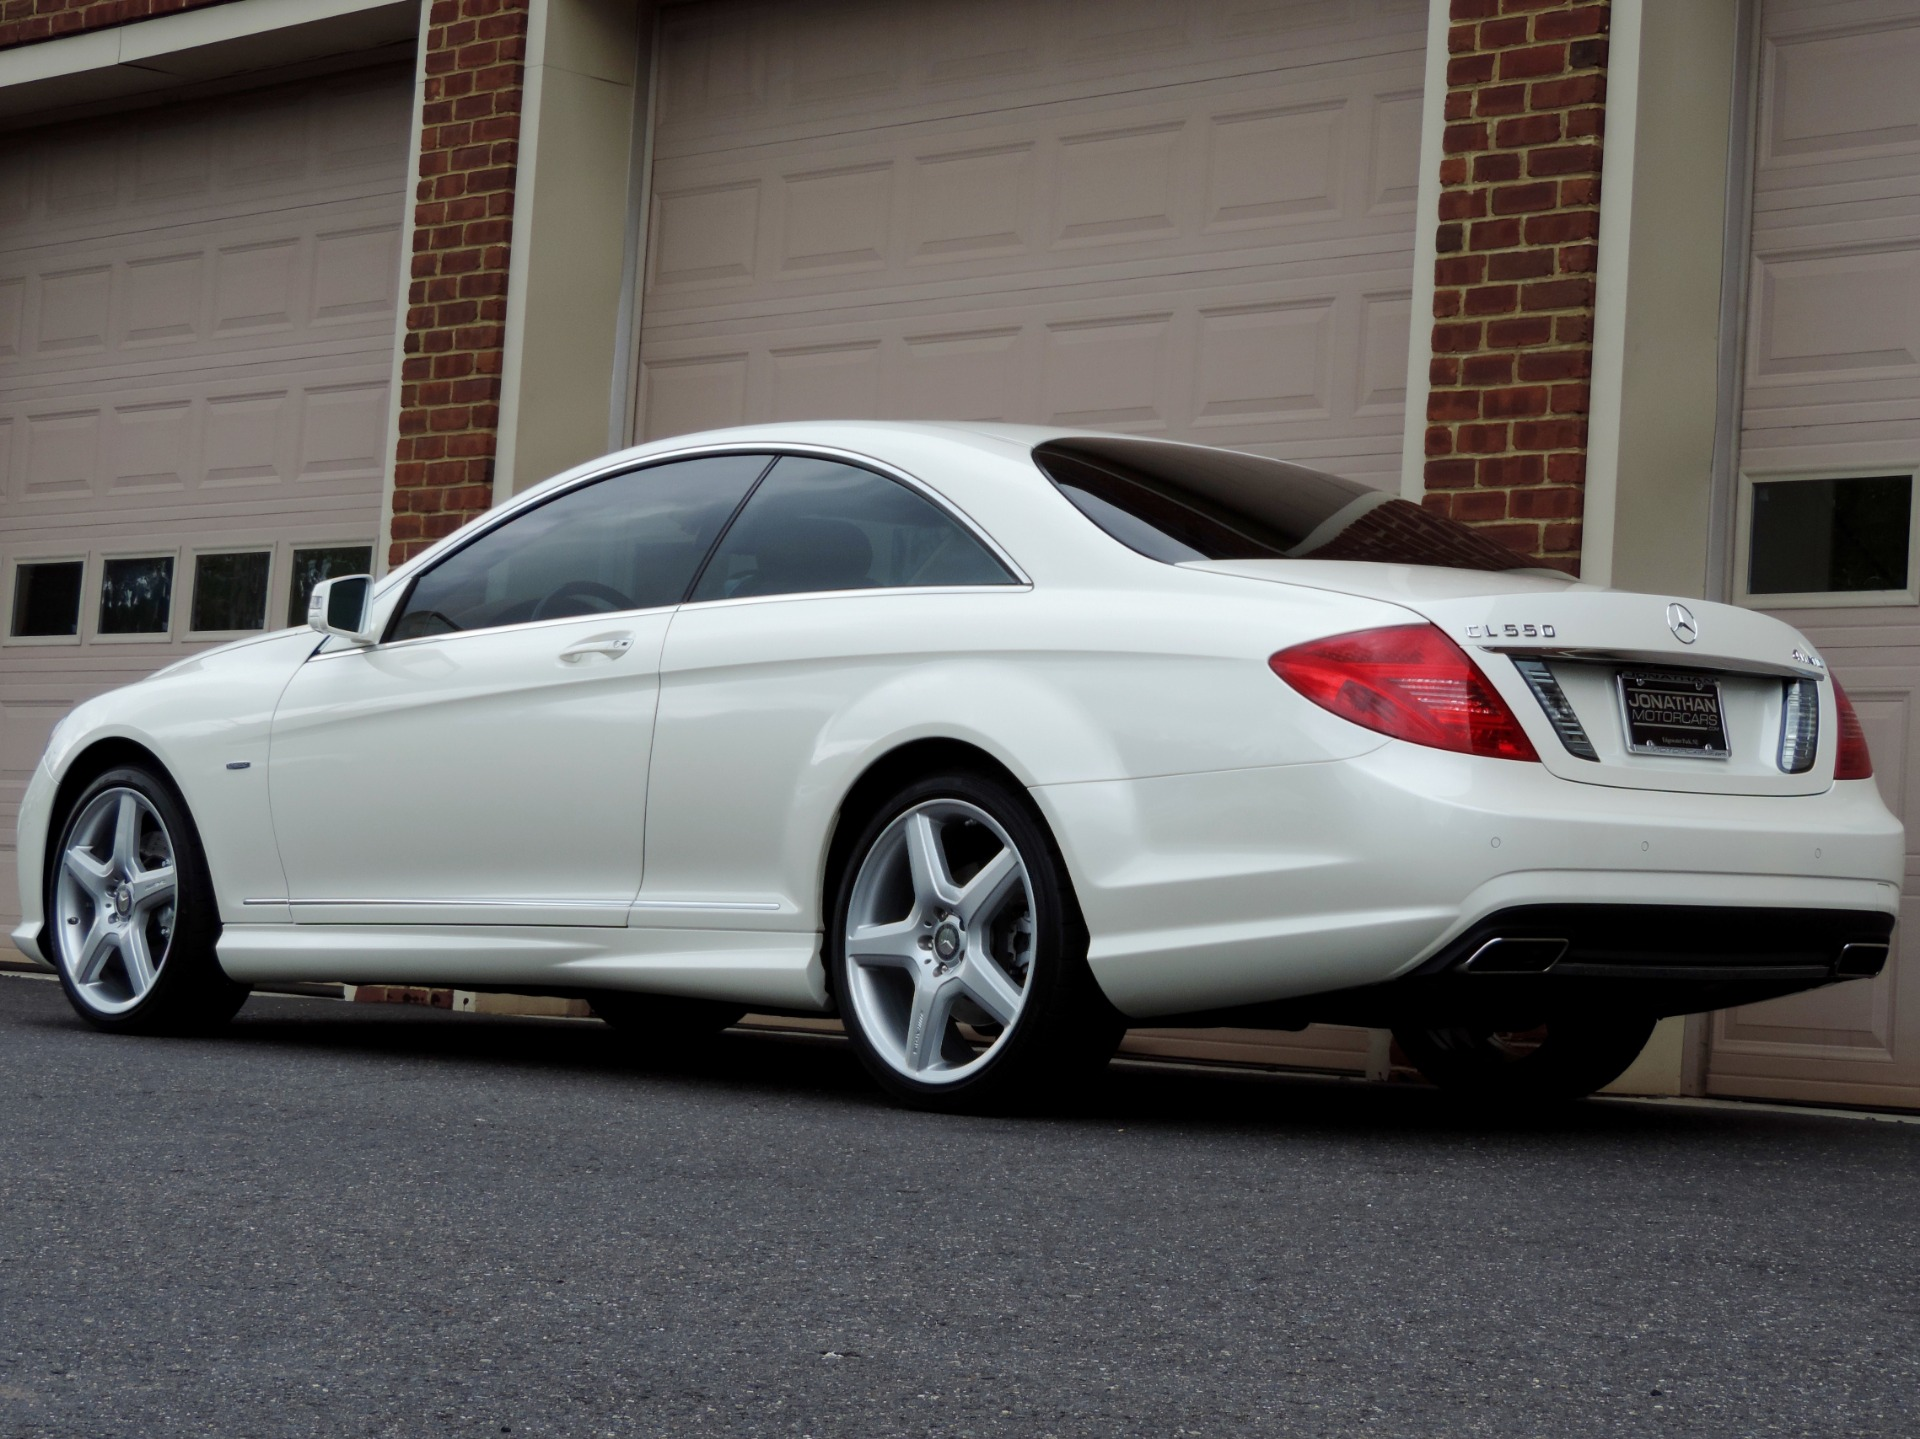 2012 mercedes benz cl class cl 550 4matic stock 029933 for Mercedes benz dealership nj